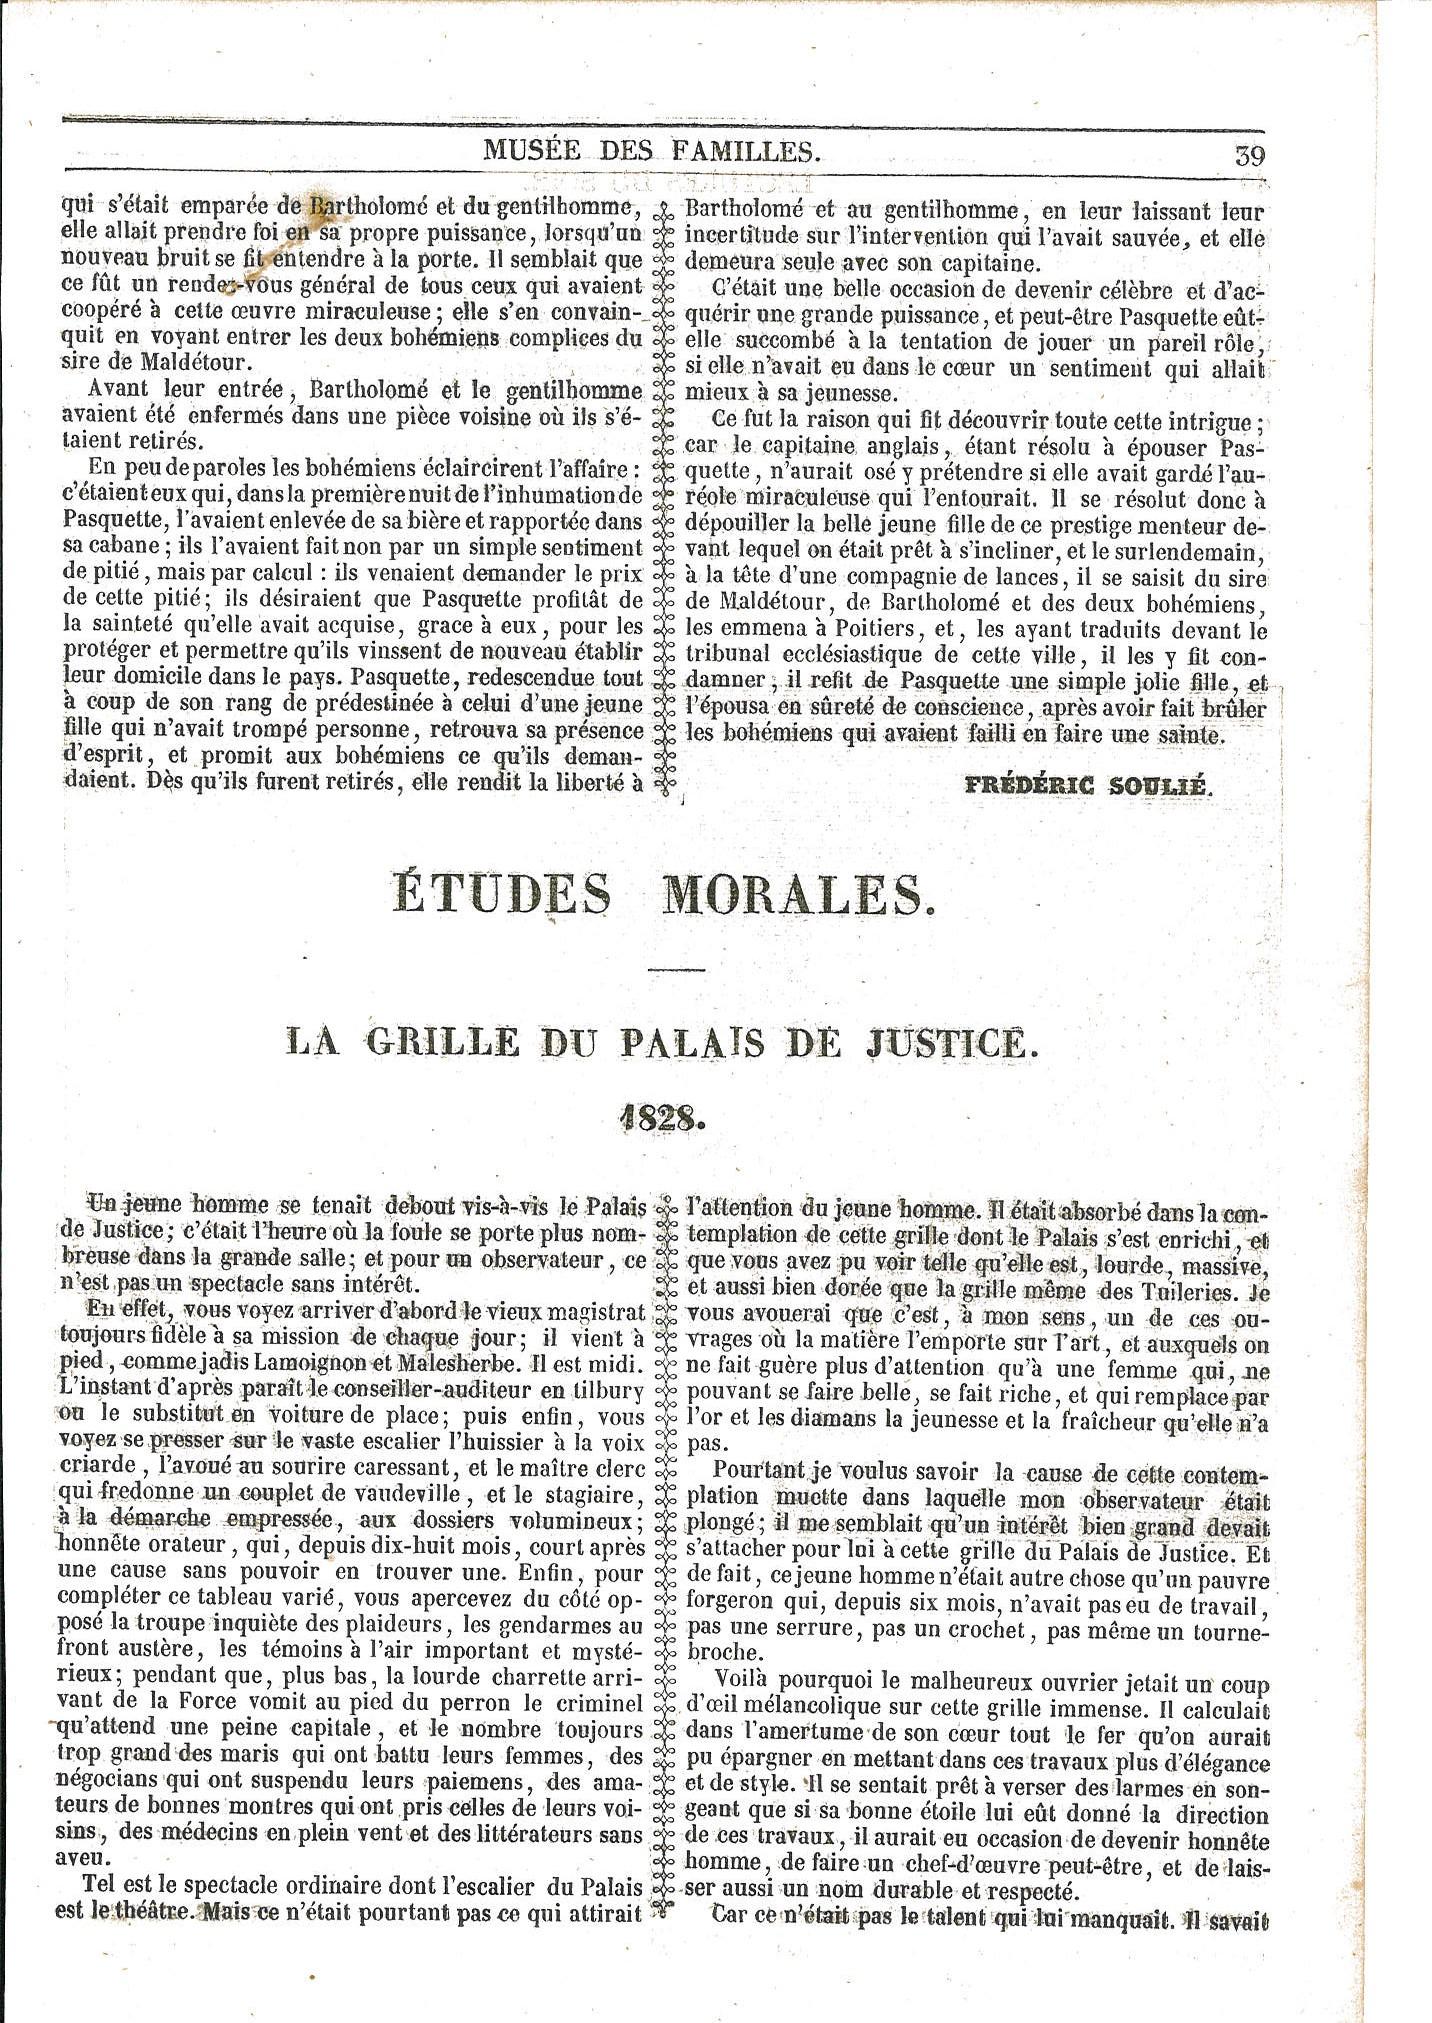 p.39.jpg - image/jpeg